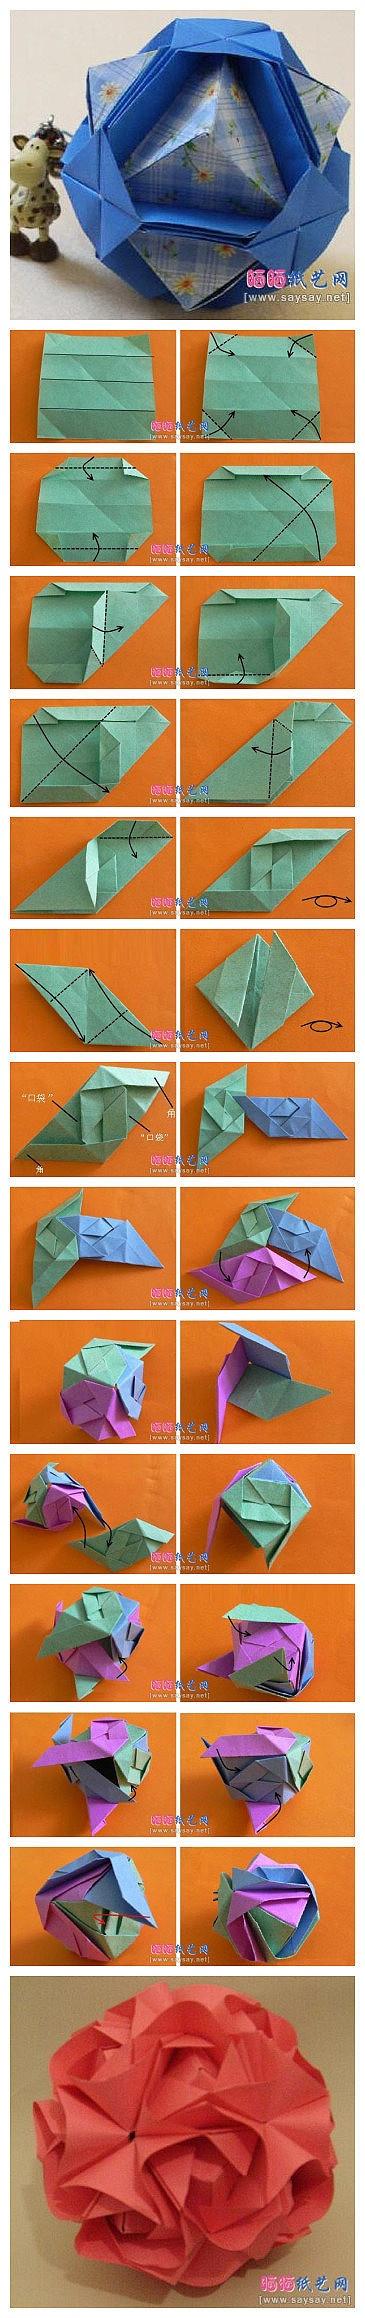 Kusudama Sonobe Diy Paper Crafts Pinterest Origami Modular Flowers Instructions Diagrams Blume Ball Folding